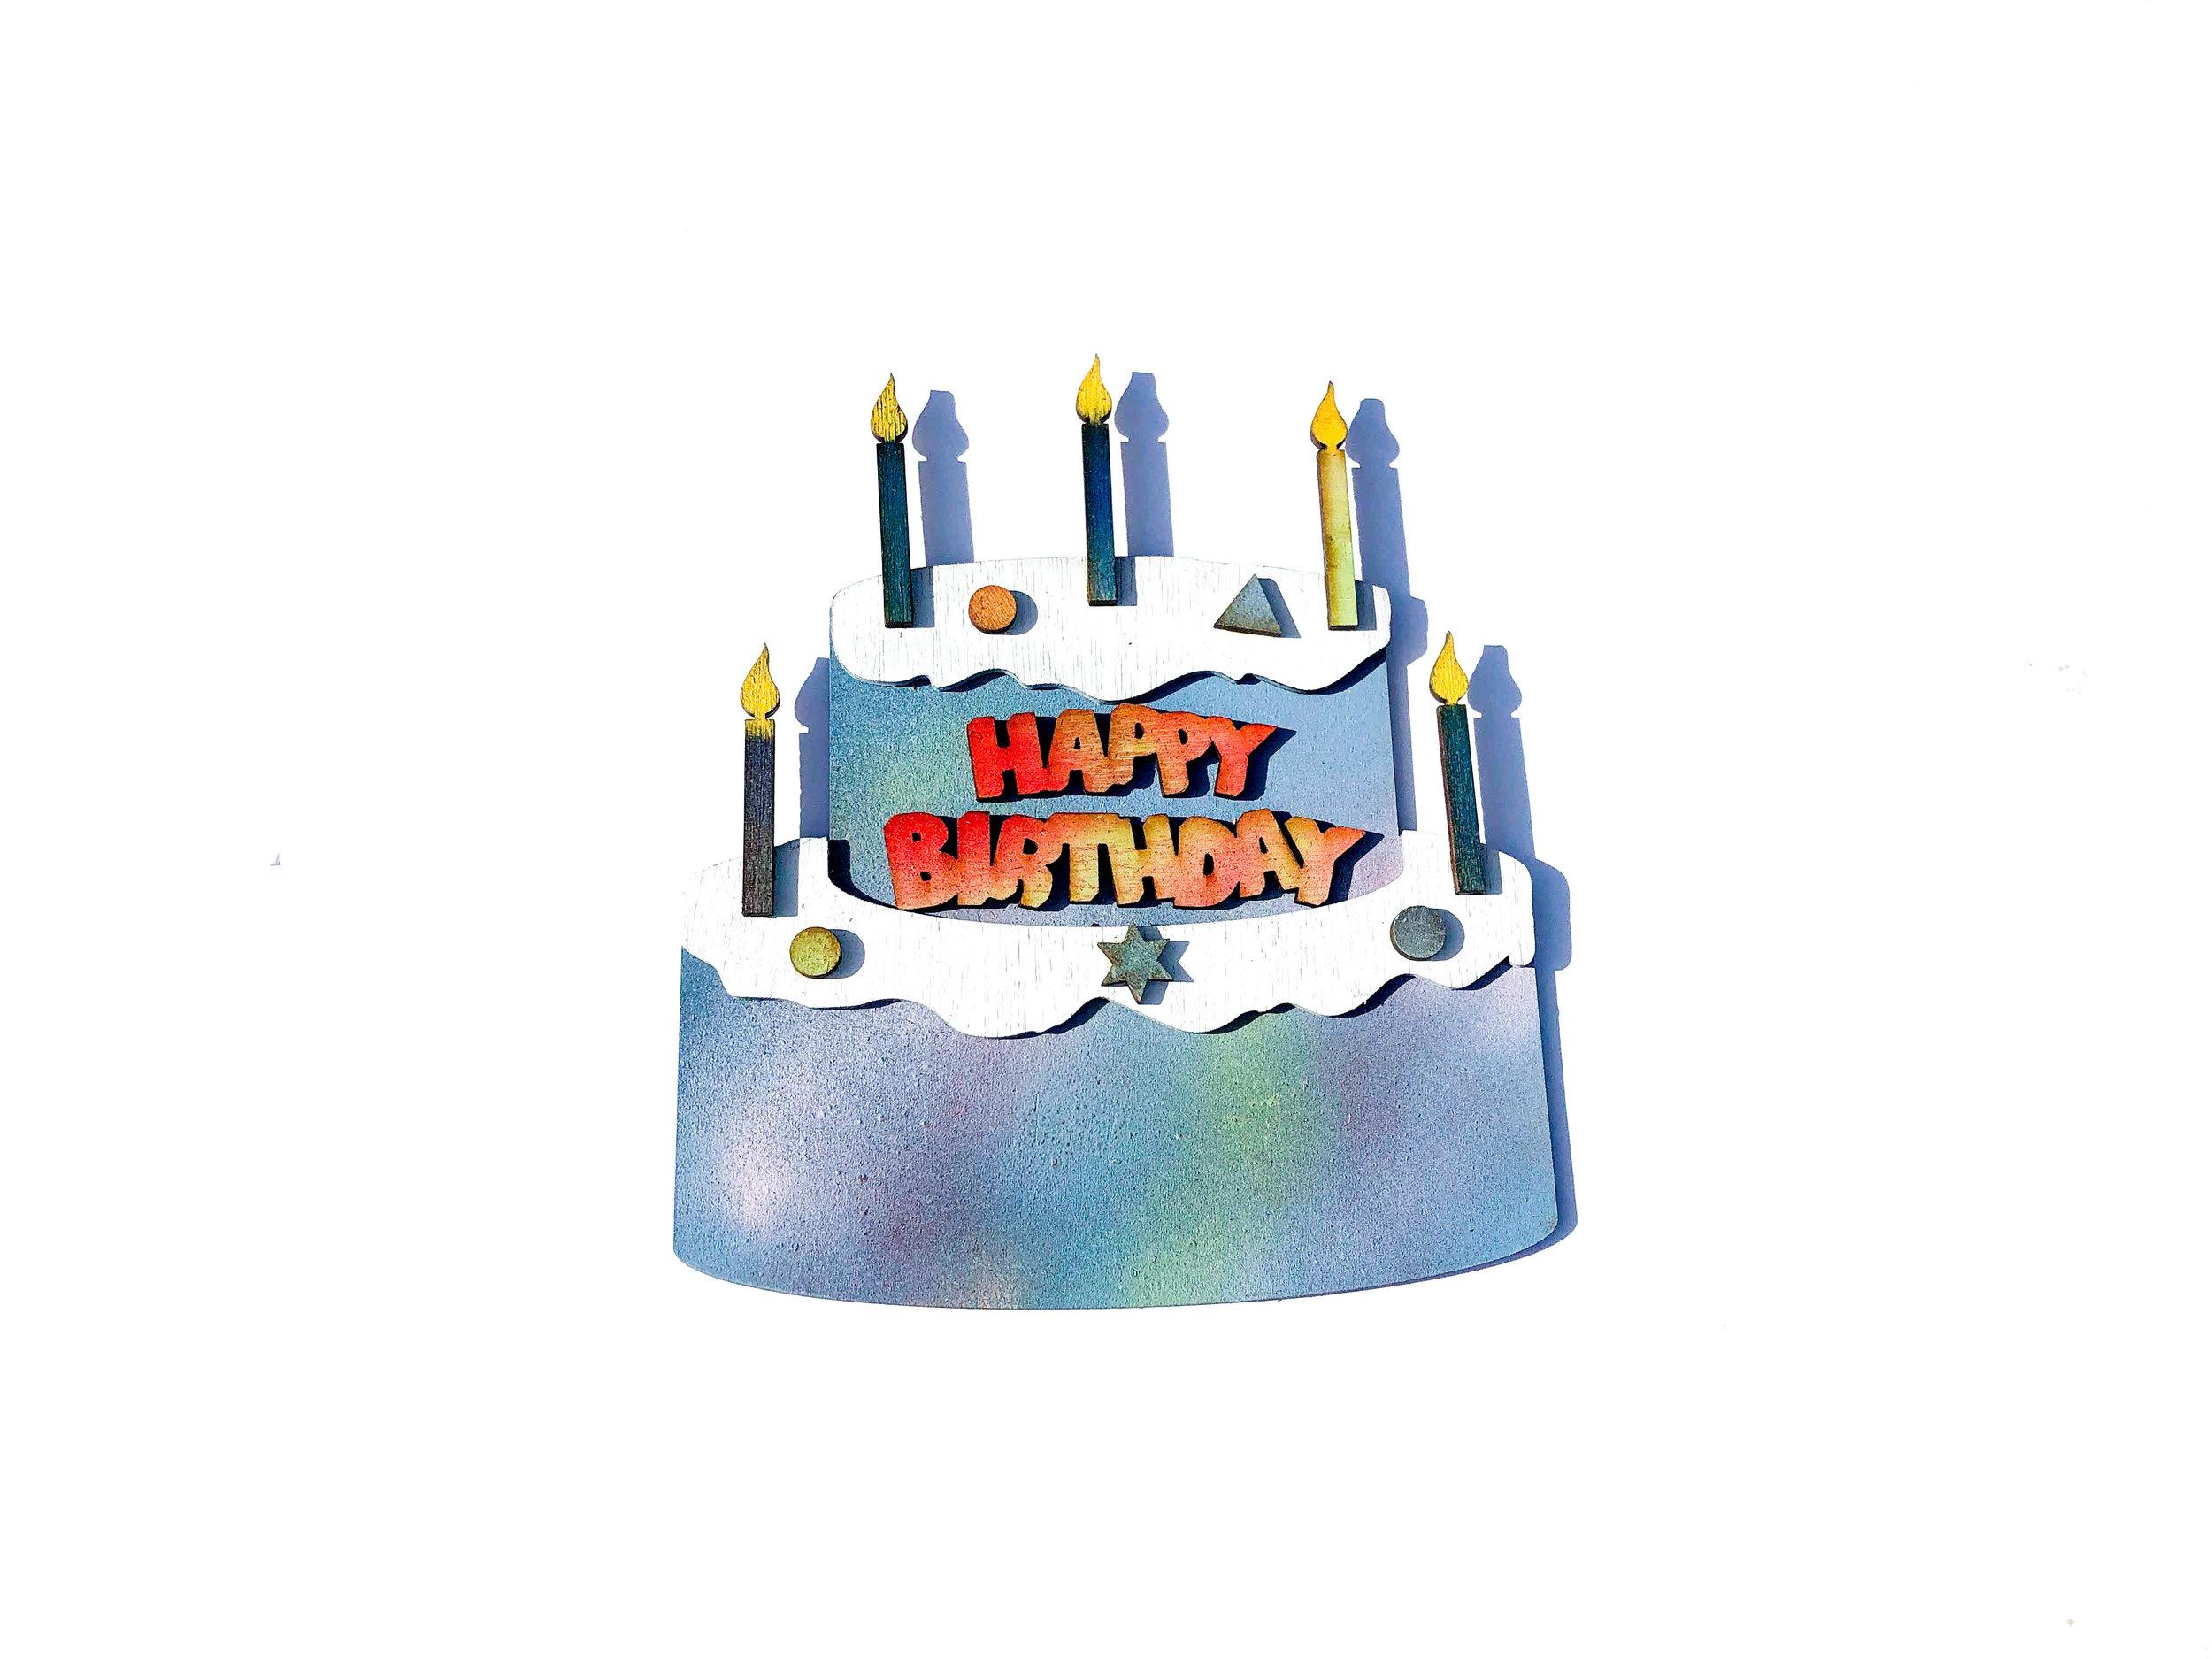 Happy Birthday Cakes (1).jpg